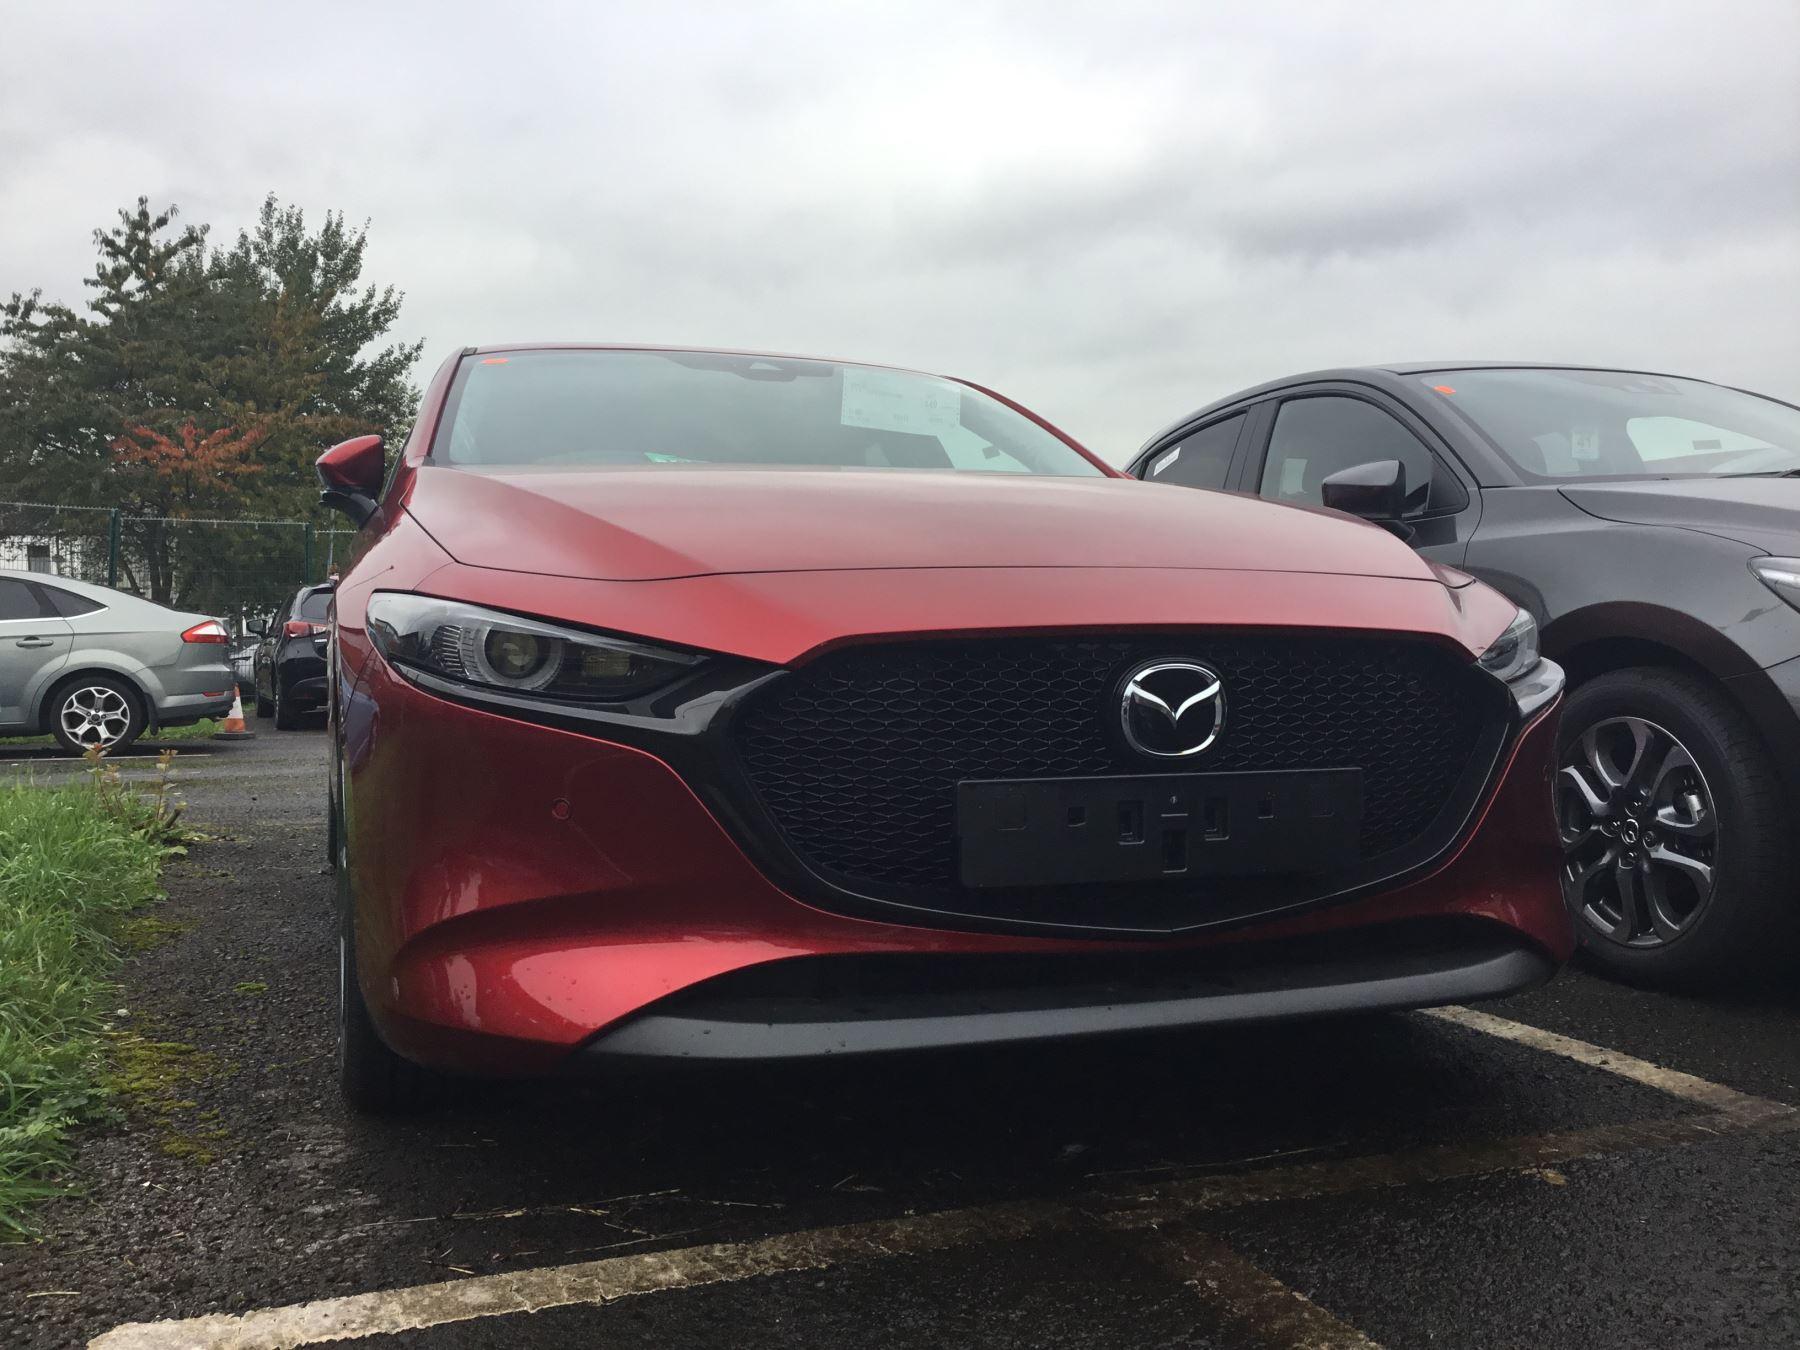 Mazda 3 2.0 Sport Lux image 2